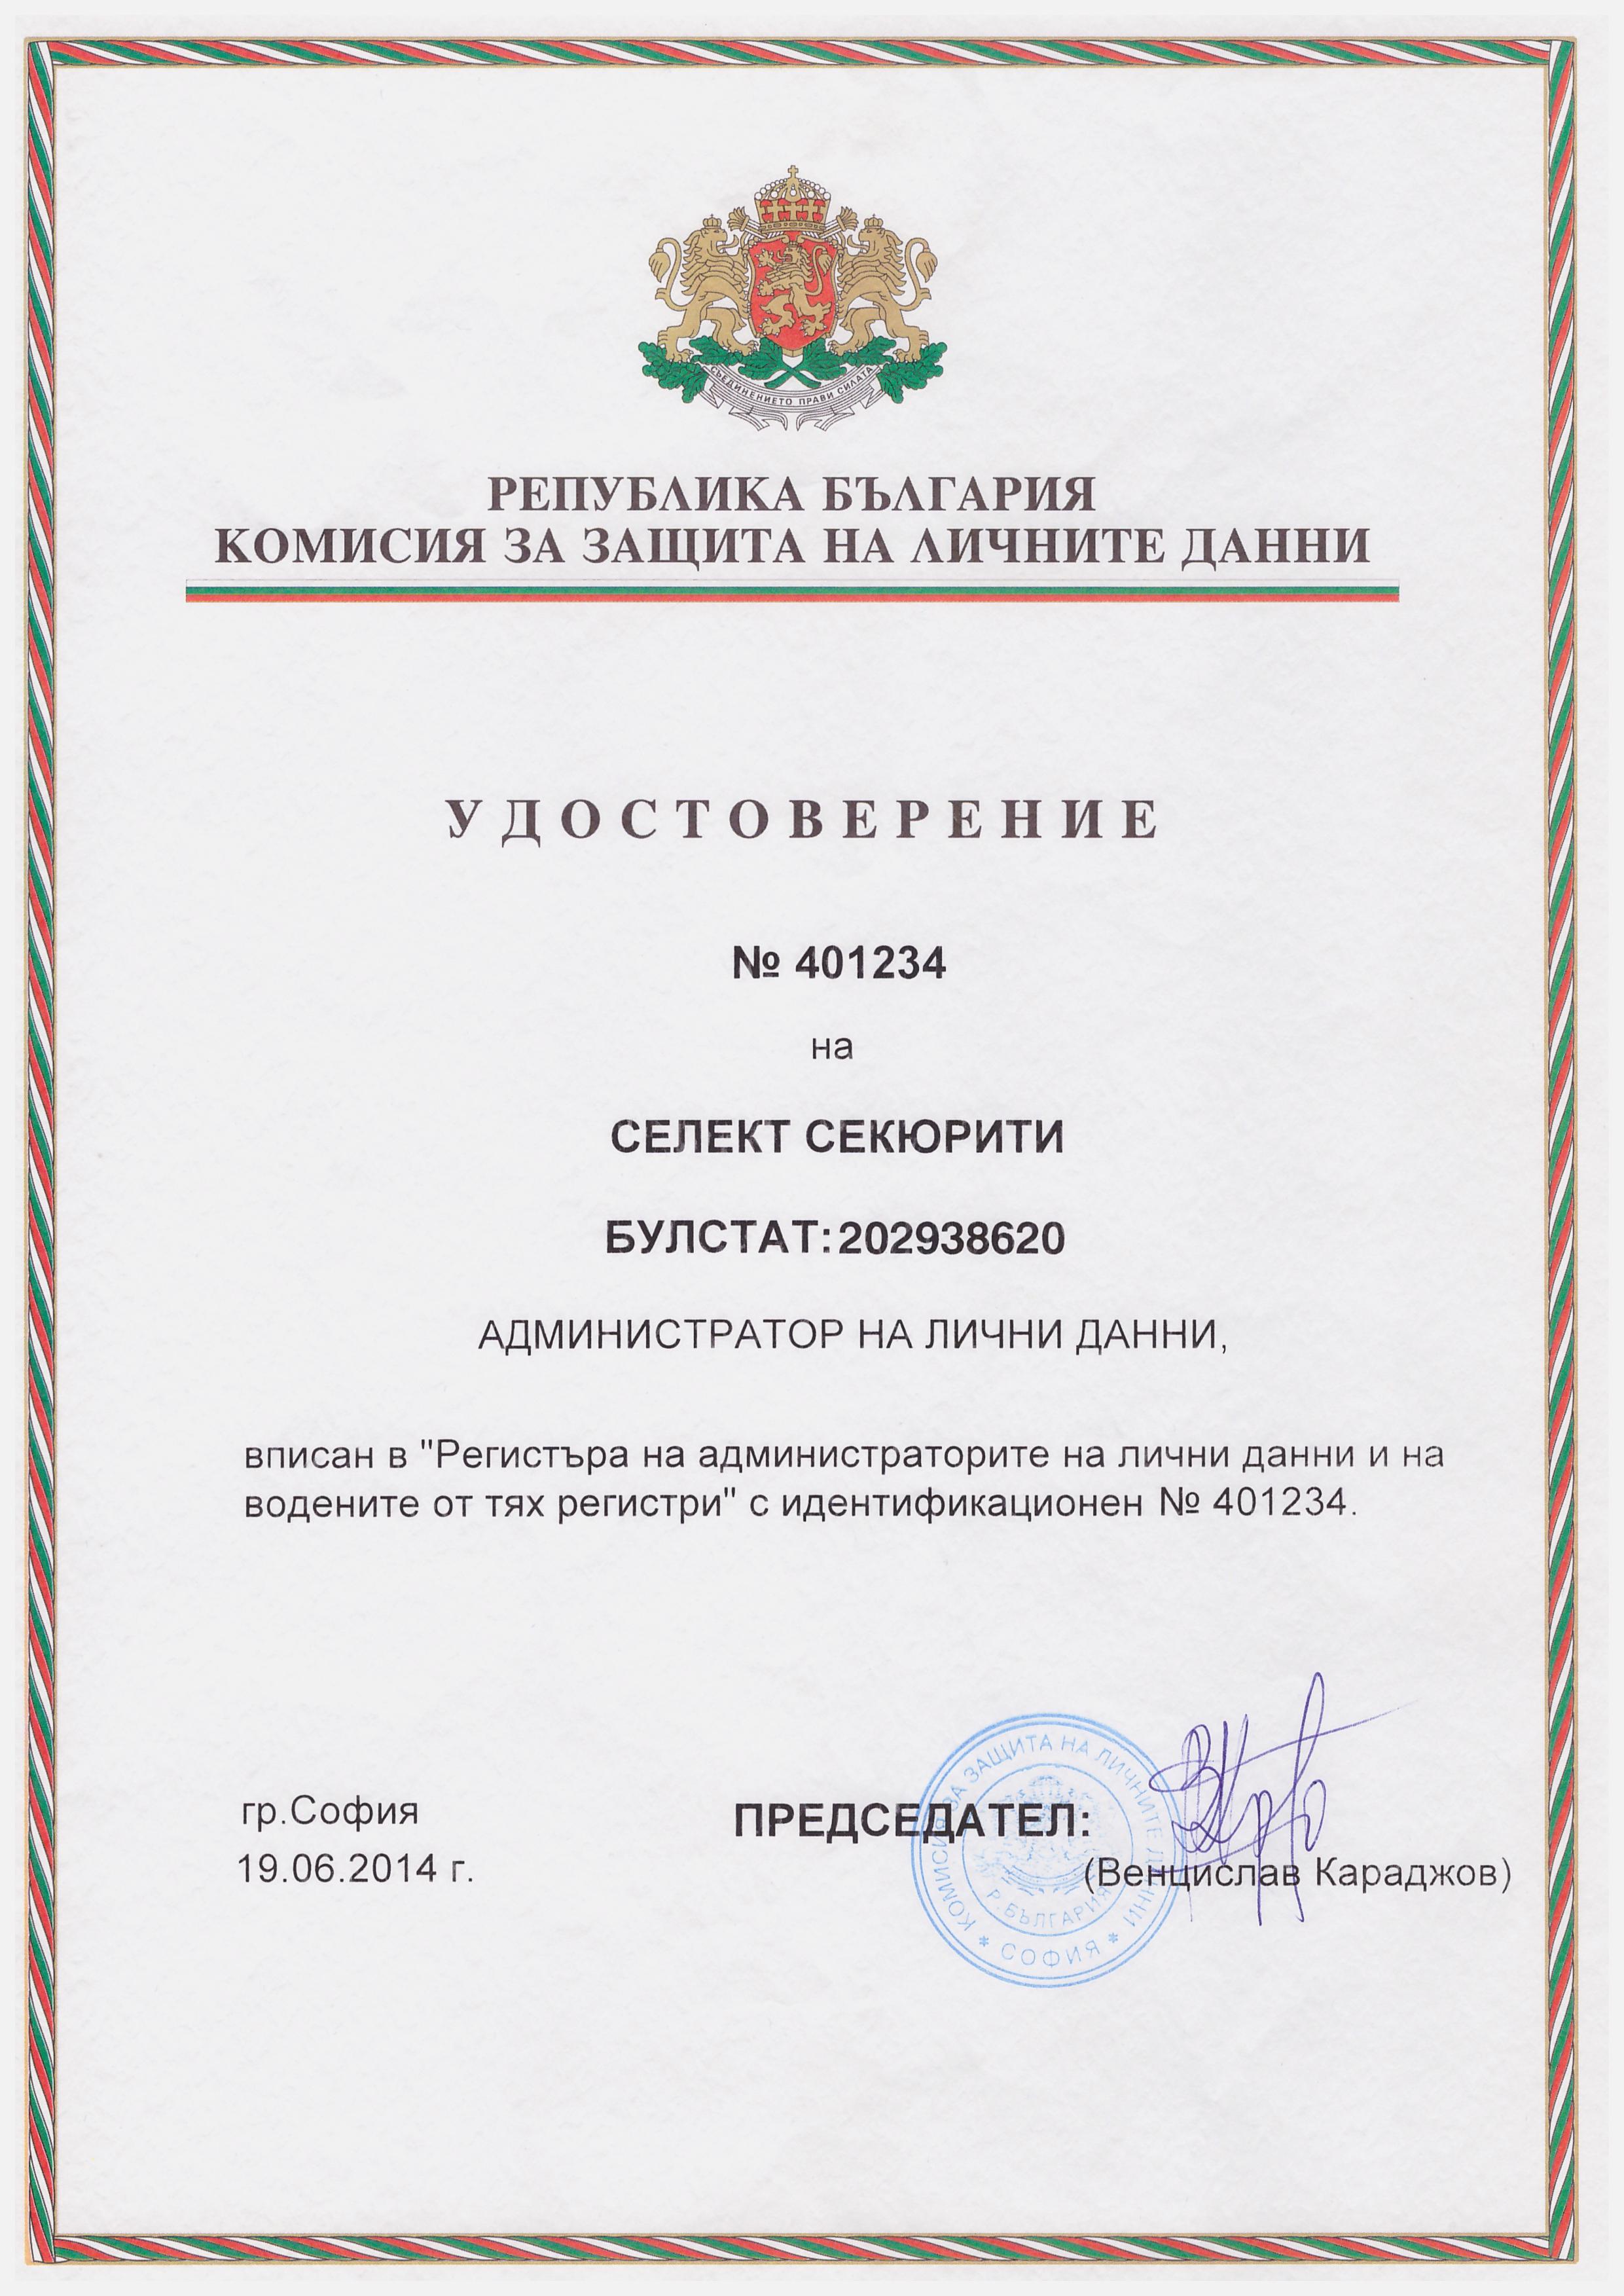 Удостоверение - Администратор на лични данни